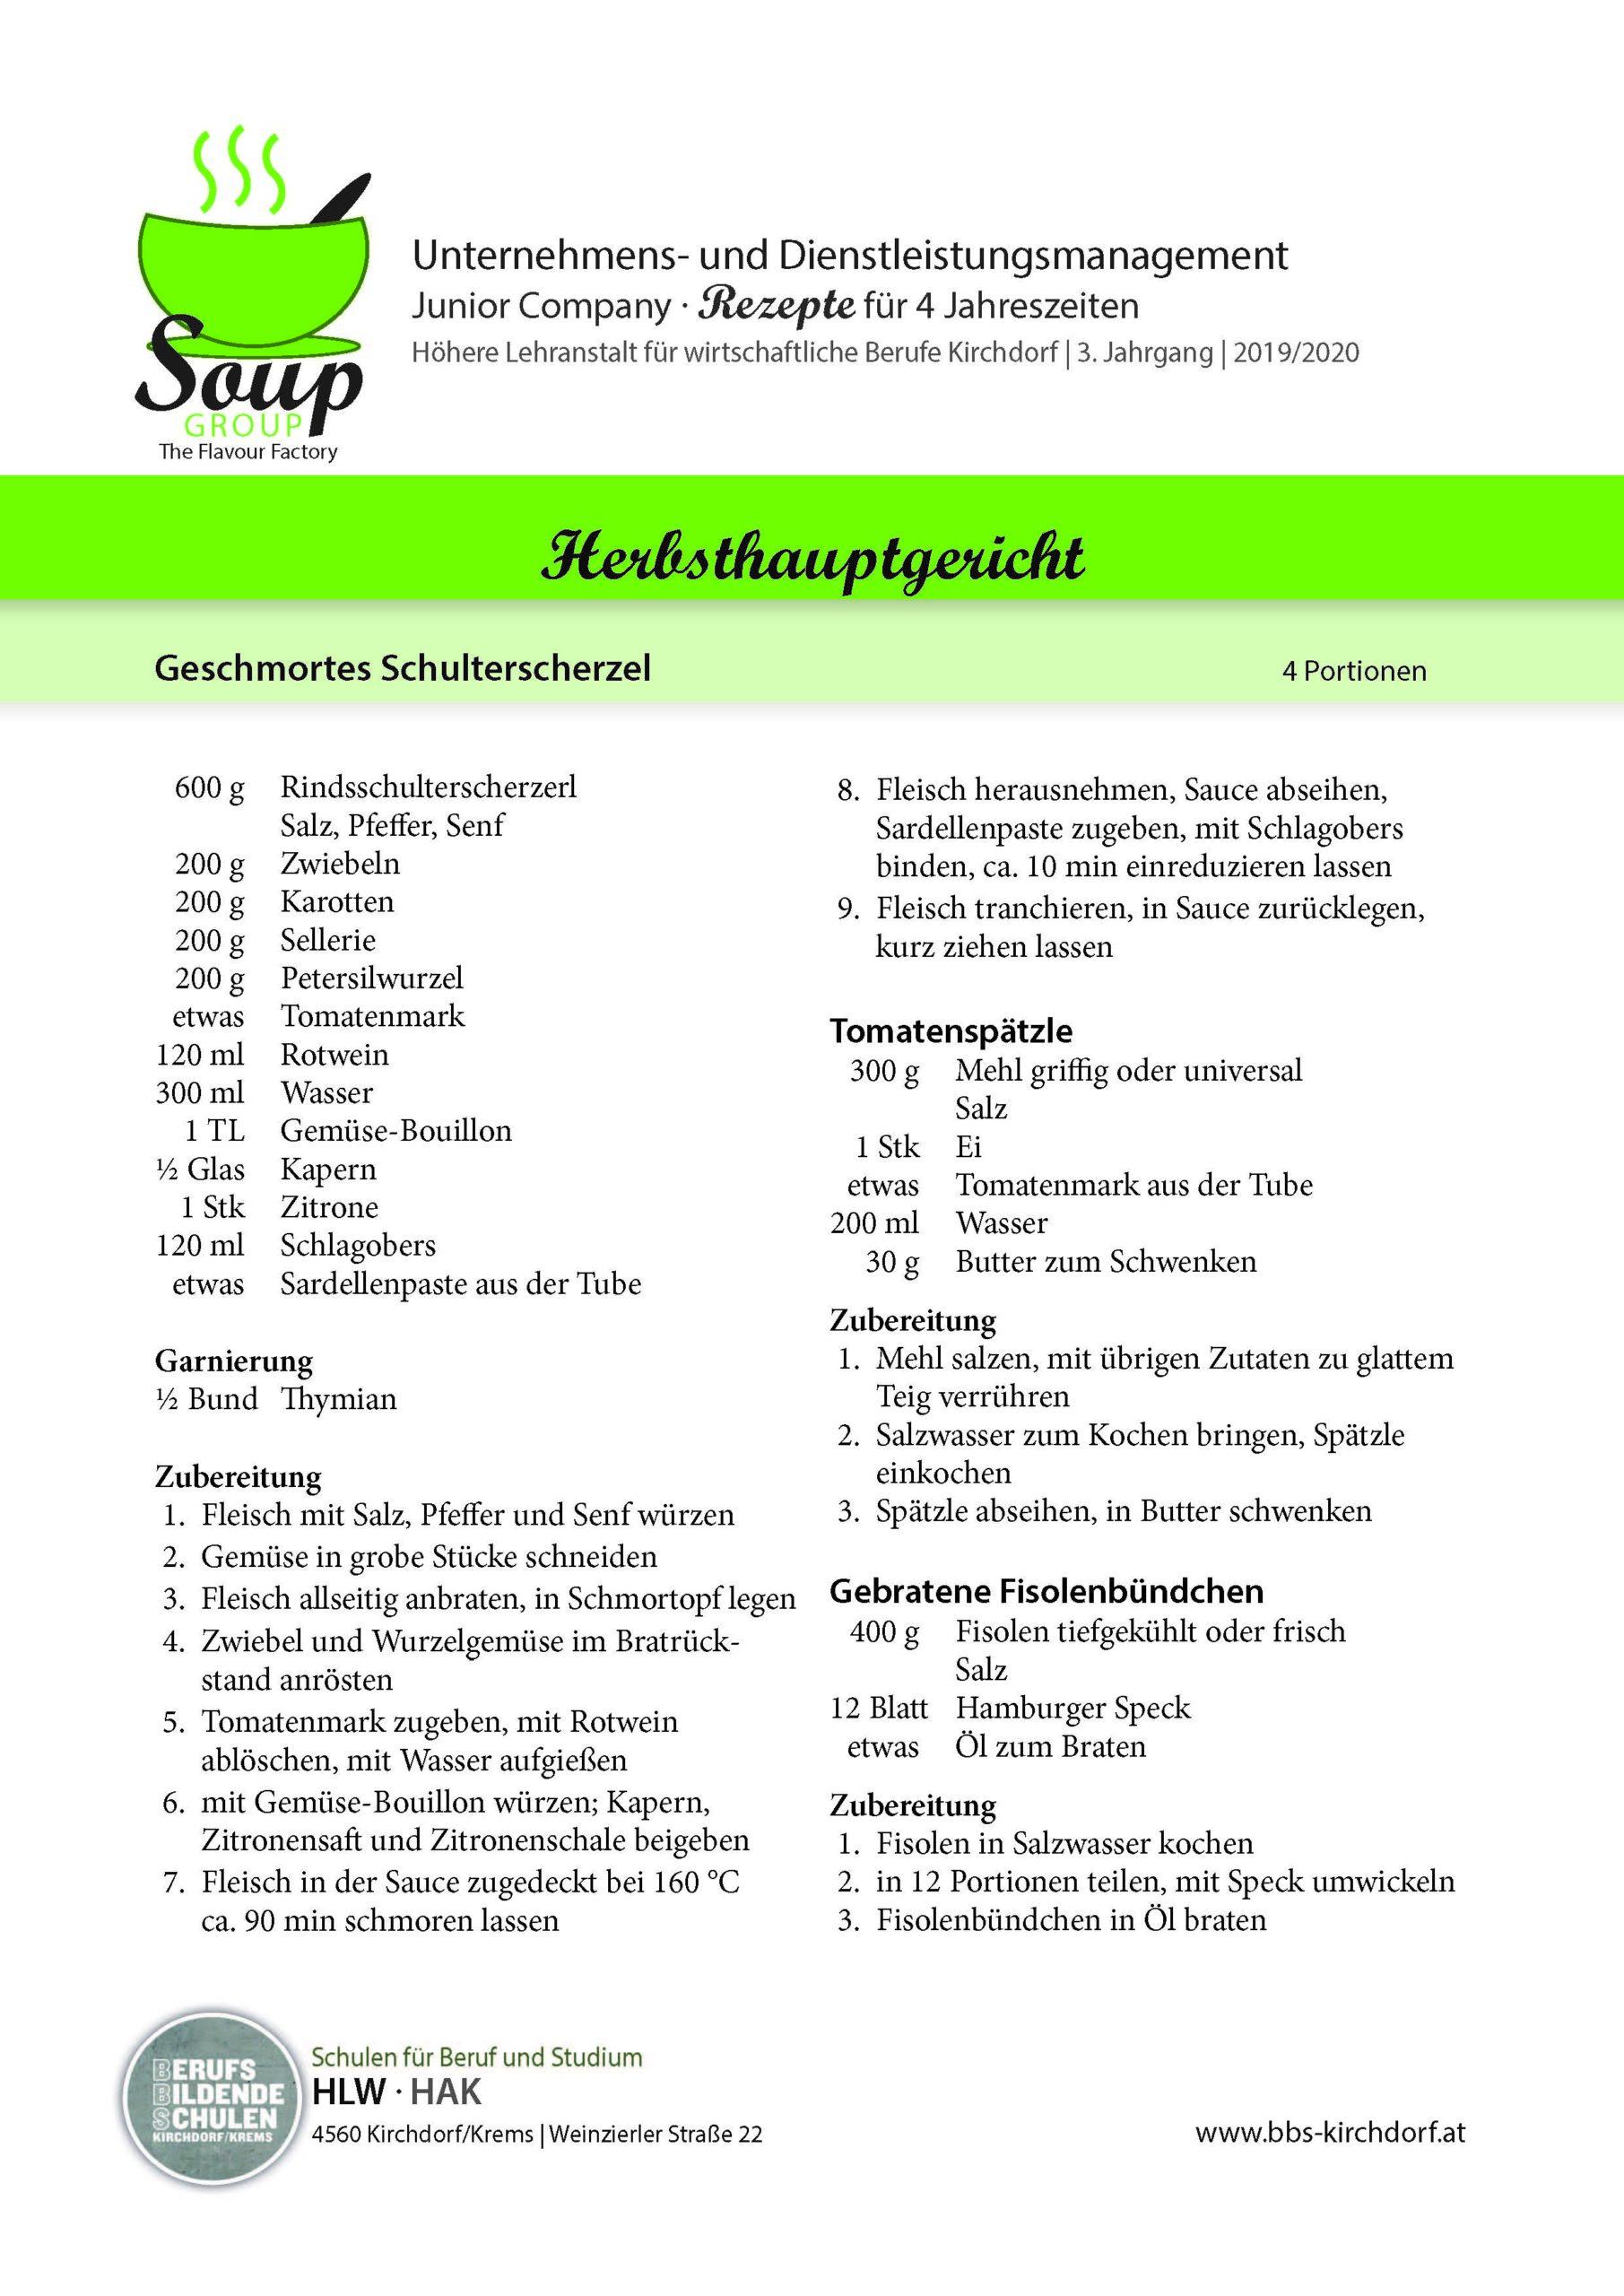 HLW_Jg3b_UDM_HerbstRezepte2020_Seite_2